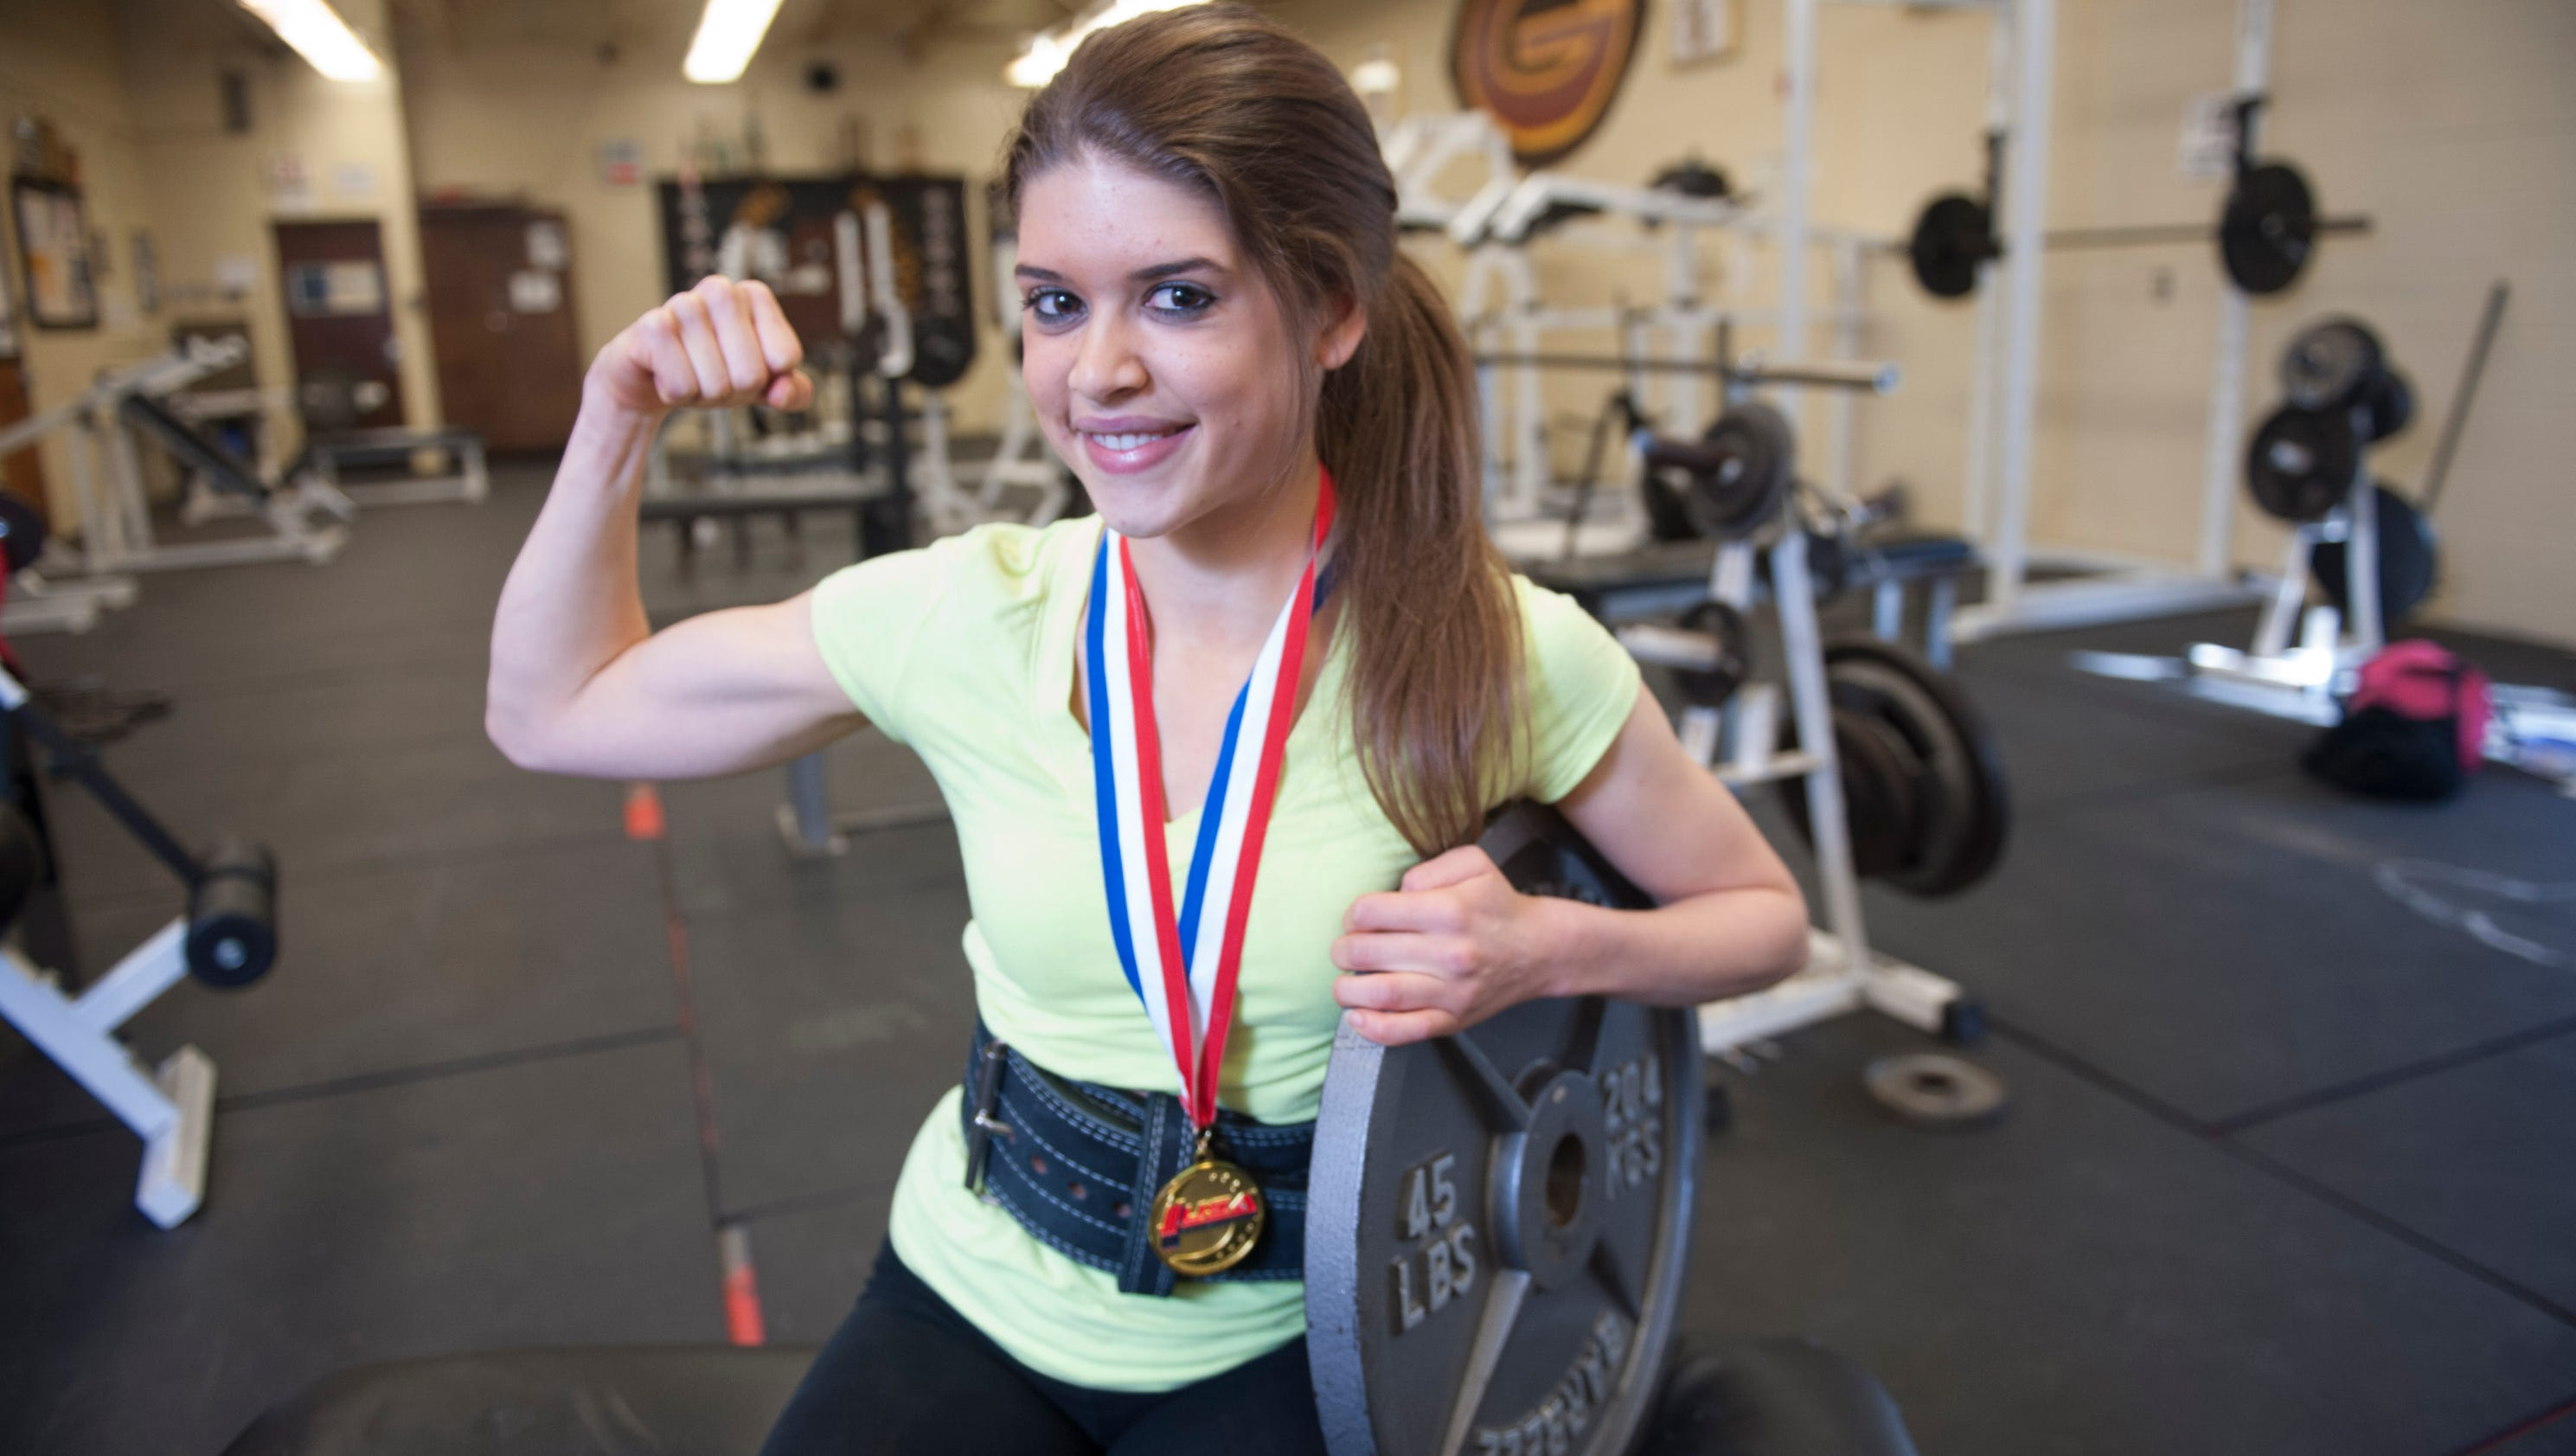 Glassboro teenage girl sets u s record in deadlift